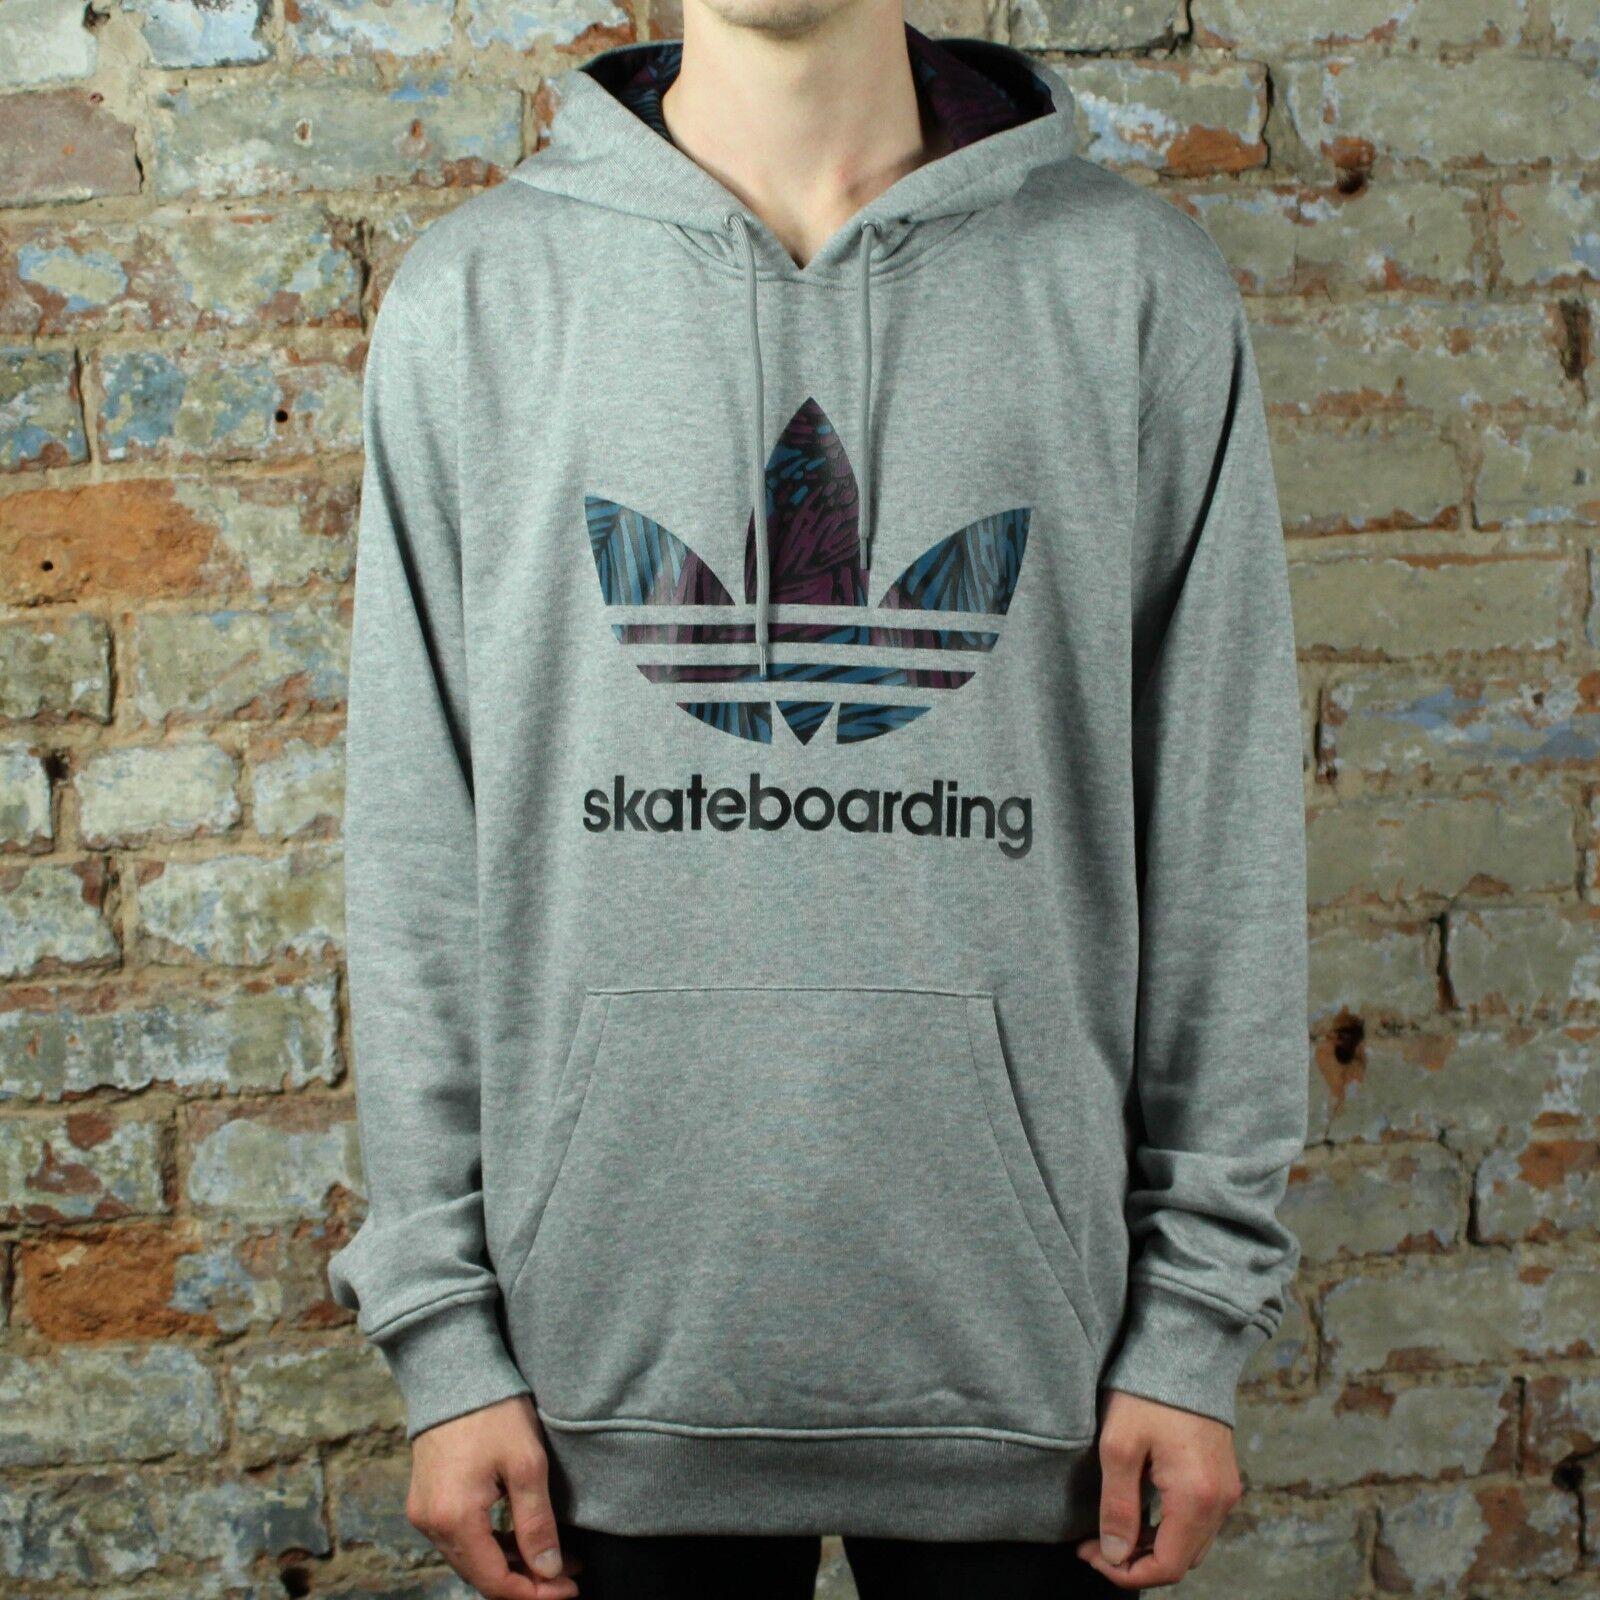 Adidas Clima 3.0 Palm Hoodie hooded Sweatshirt – Heather Grey size S,M